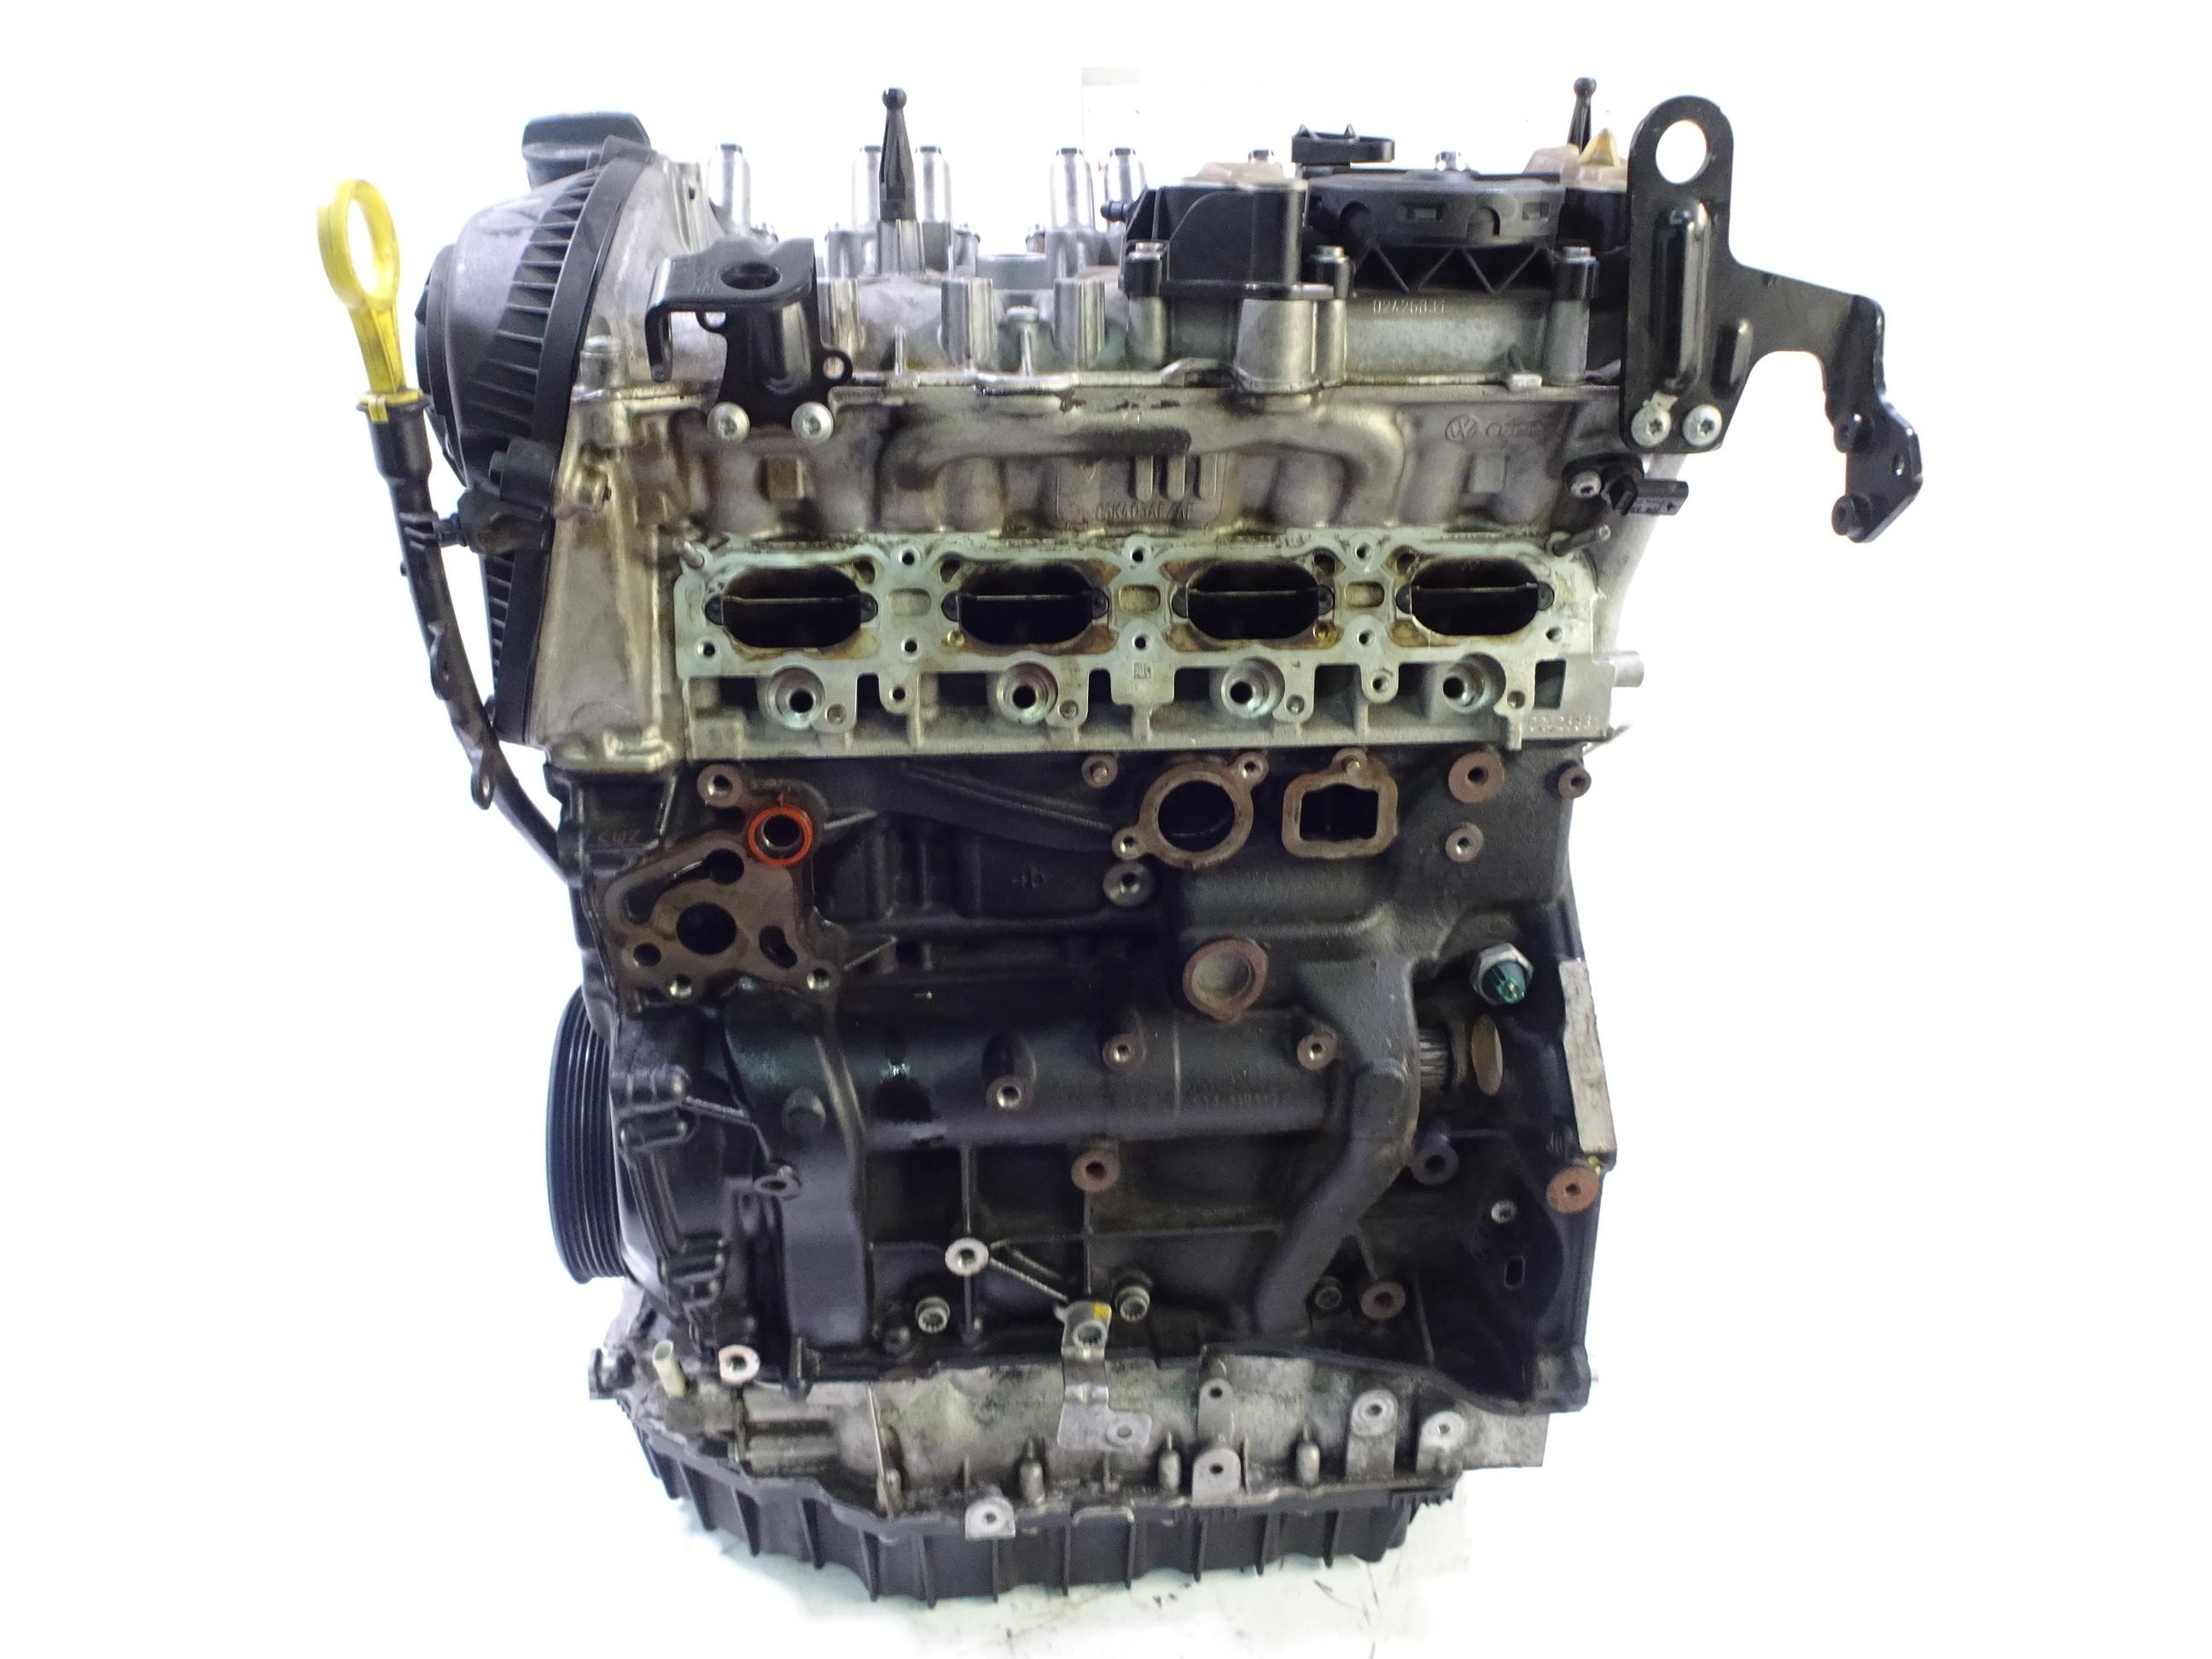 Motor 2016 Audi A1 S1 2,0 TFSI Benzin quattro CWZ CWZA 231 PS